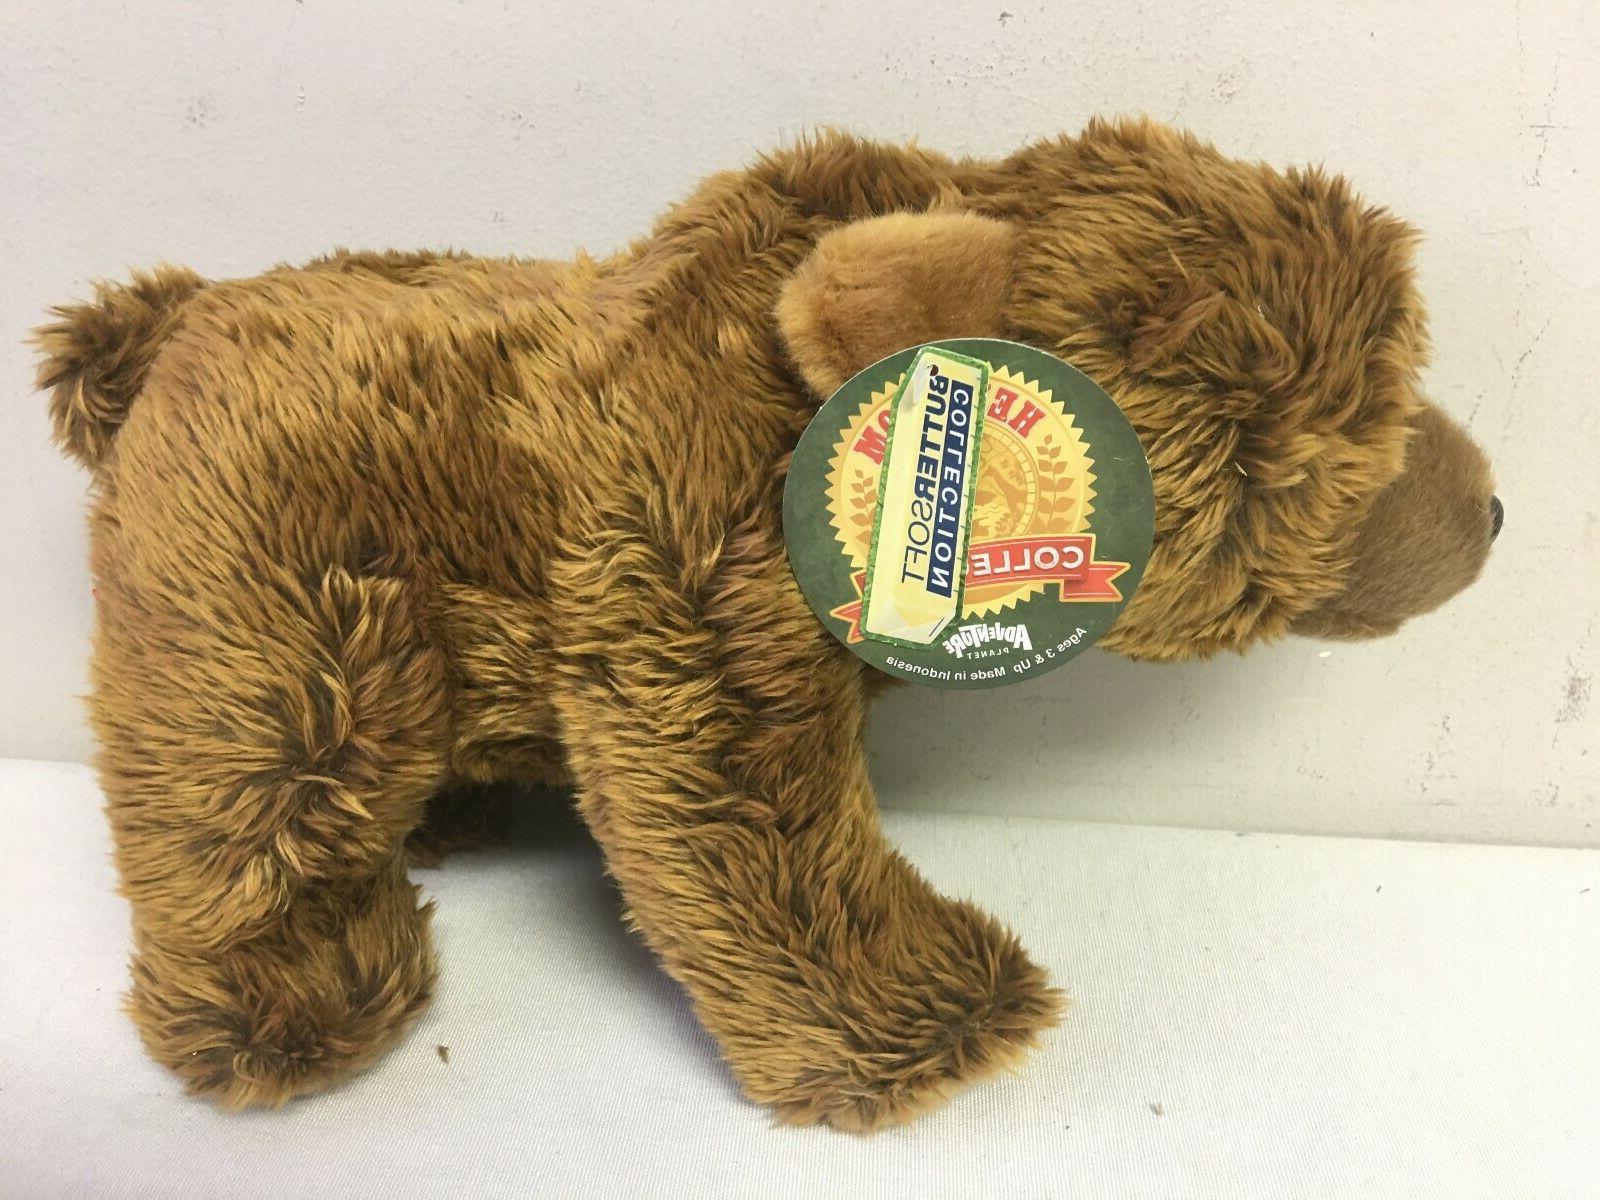 12 floppy grizzly bear plush stuffed animal